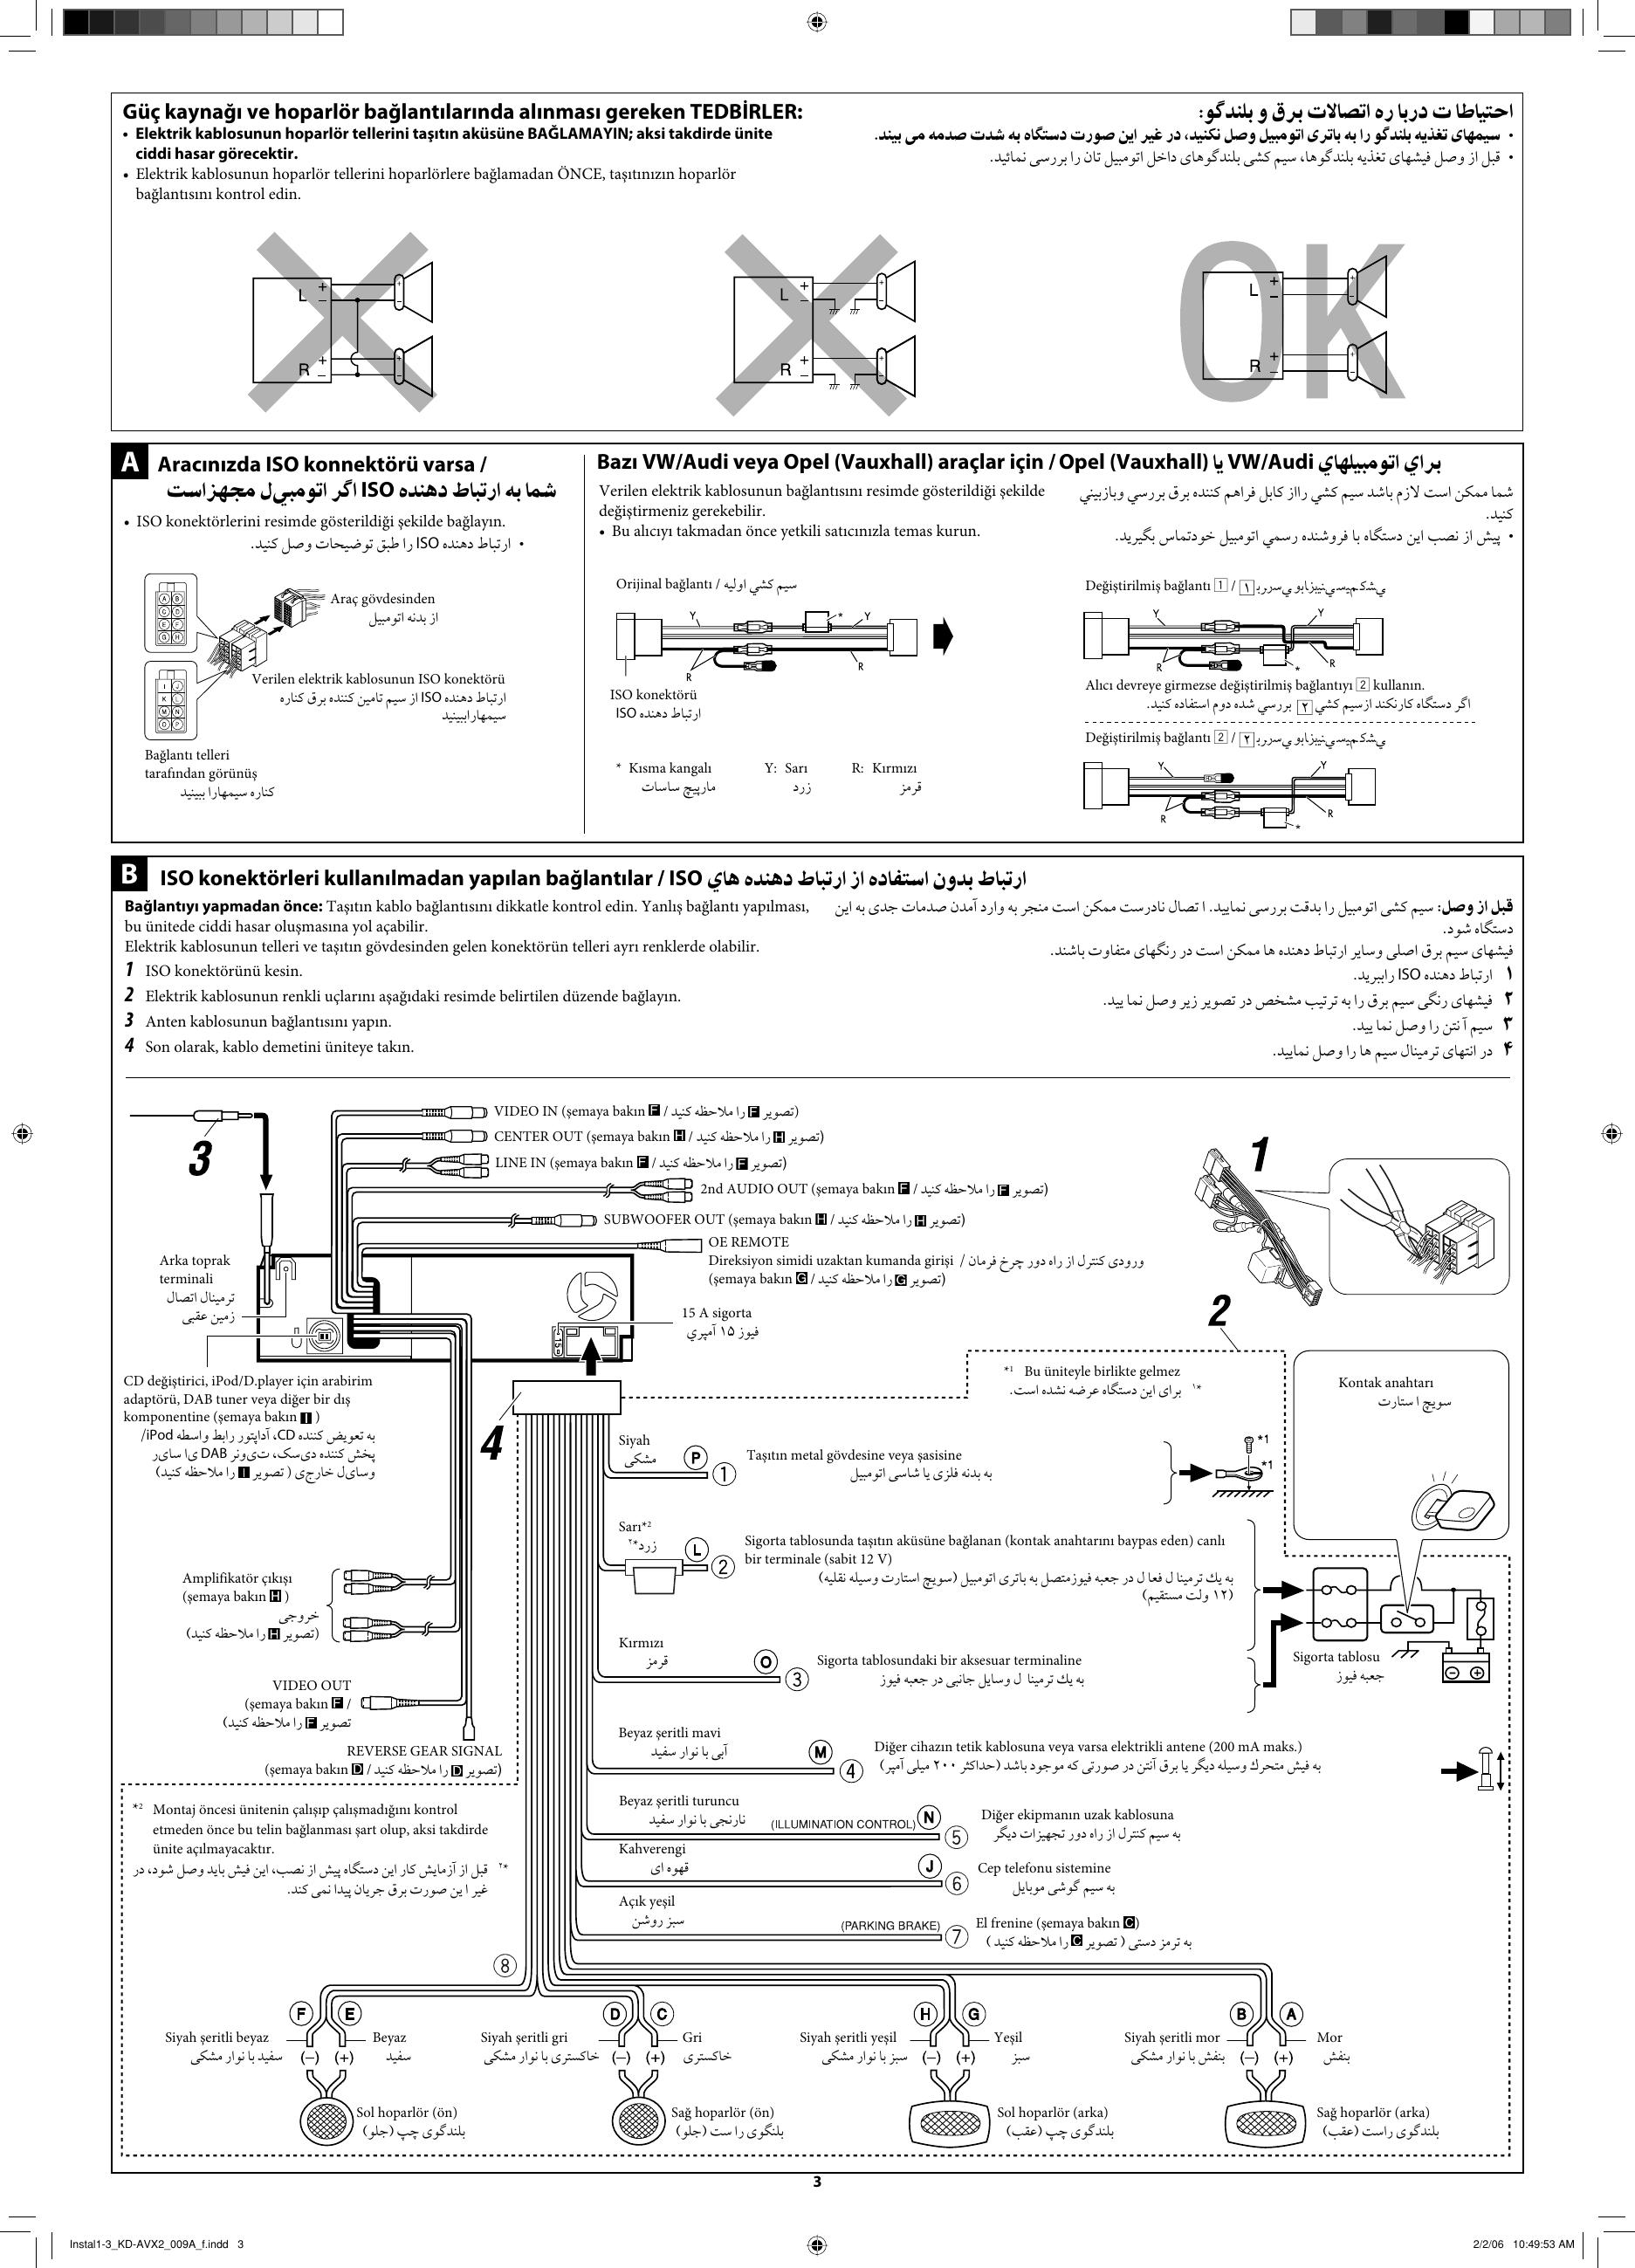 Jvc Kd Avx2 Wiring Diagram from usermanual.wiki